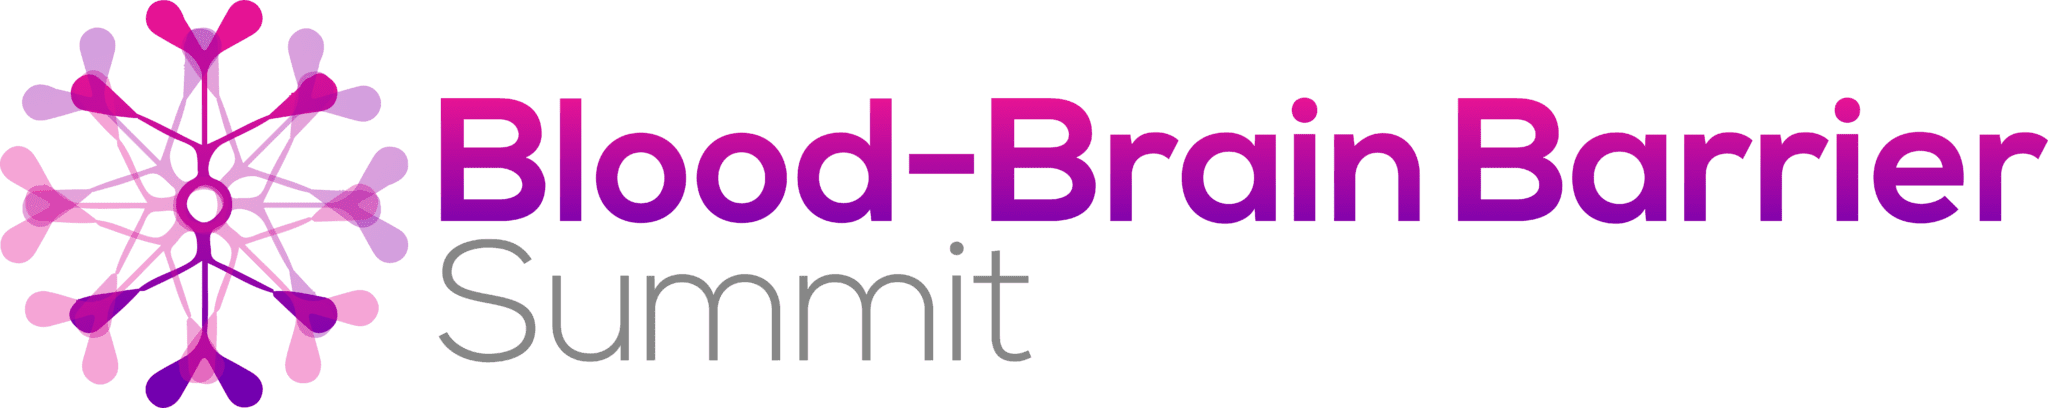 Blood-Brain Barrier Summit 2020 logo FINAL